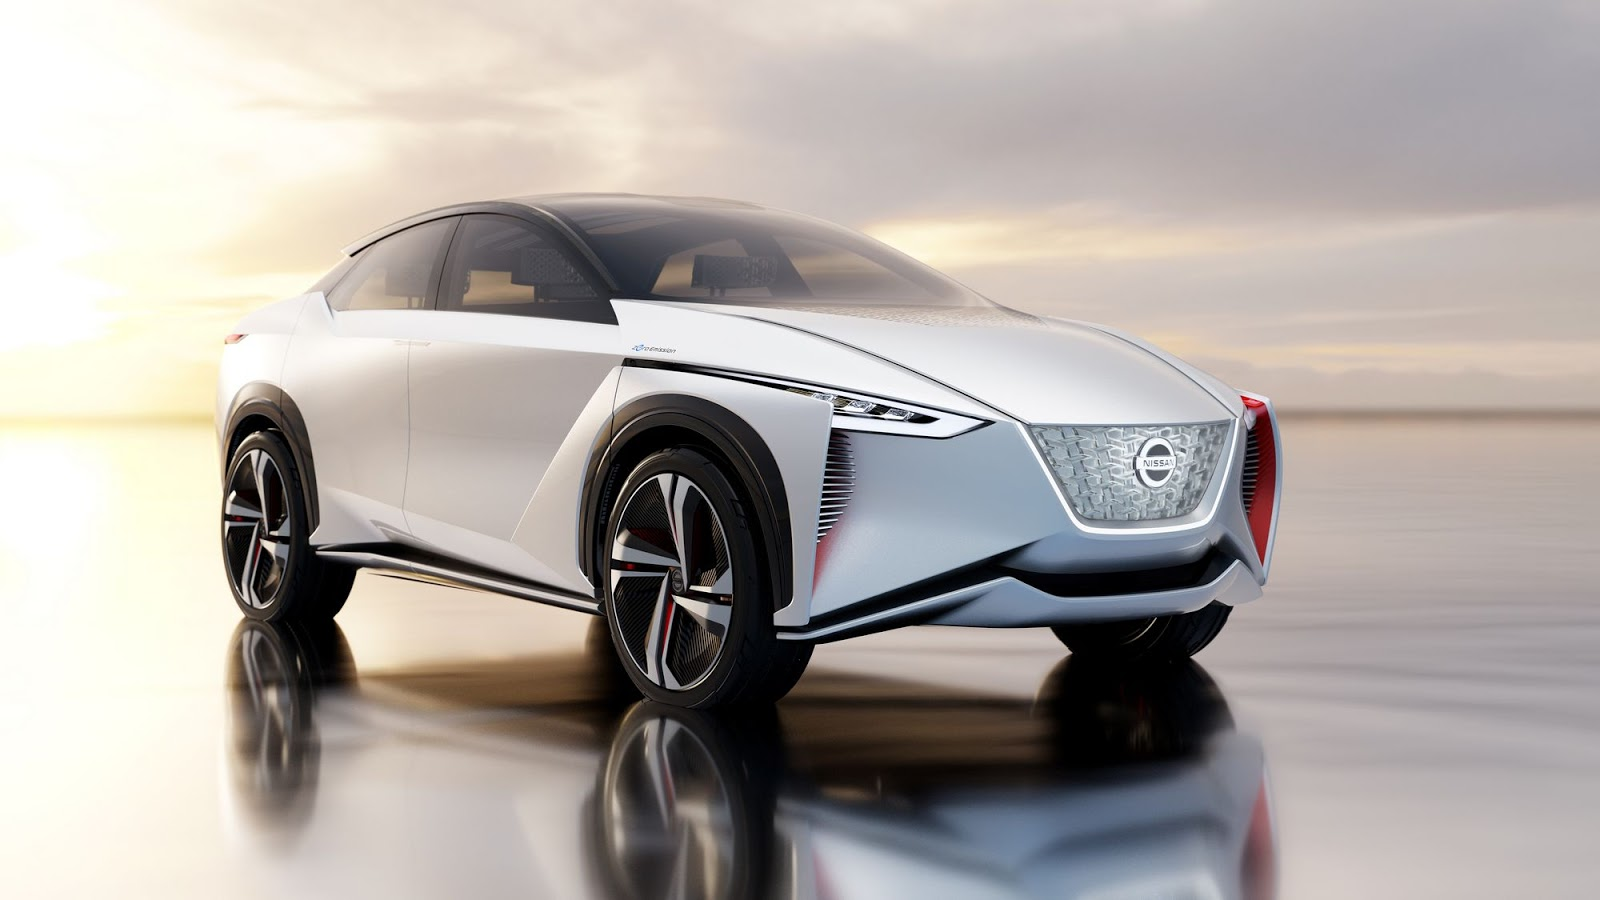 Концепт Nissan IMx показали в Токио